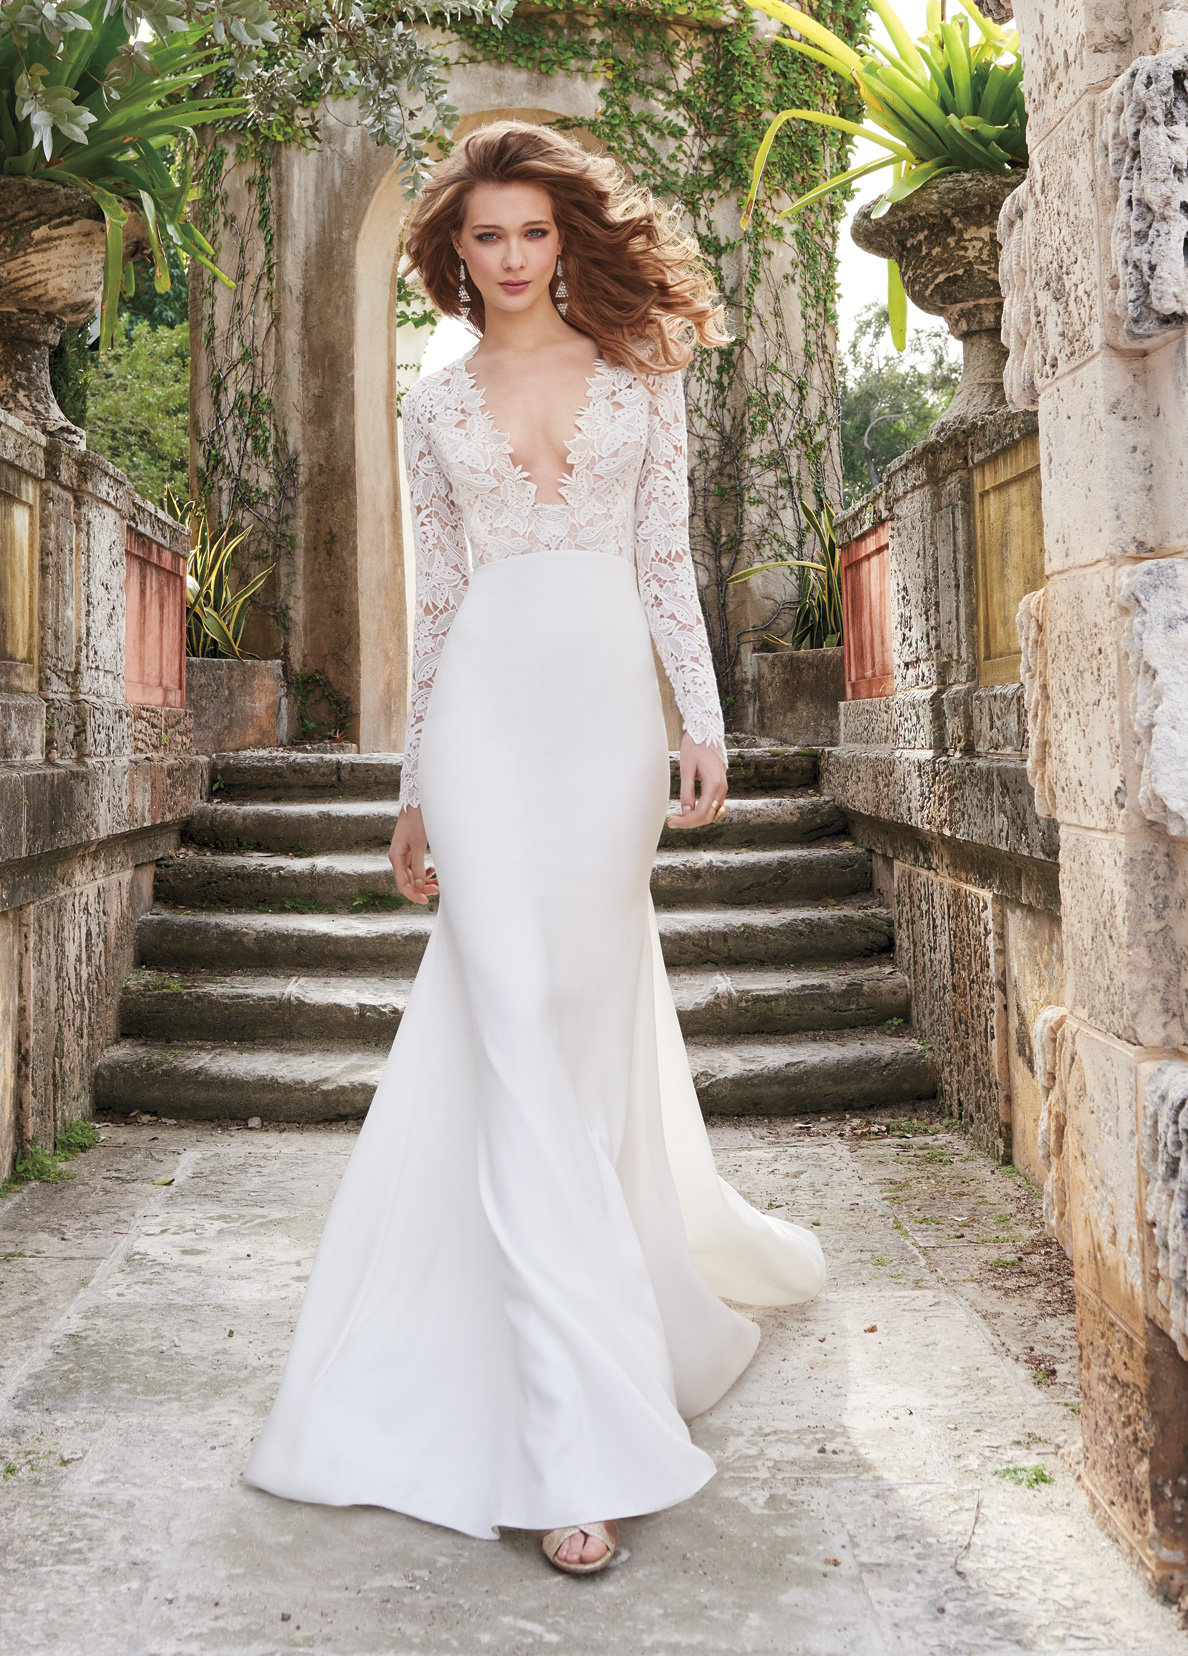 Bridesmaid Dresses 2014 Long Sleeve